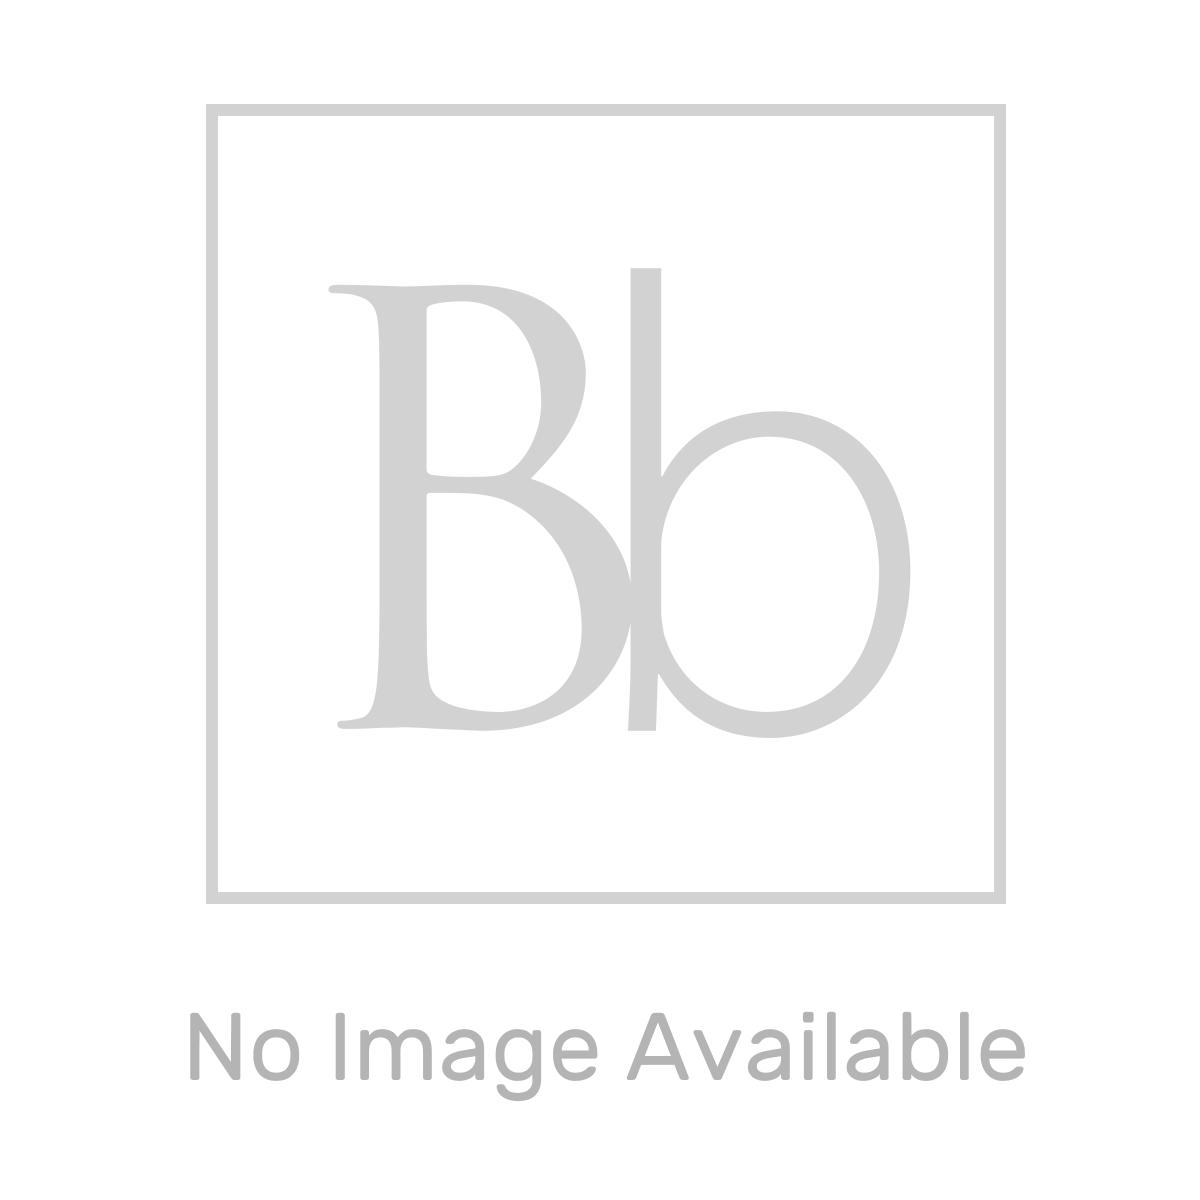 Frontline Aquaglass+ Frameless 4 Fold Bath Screen Detail